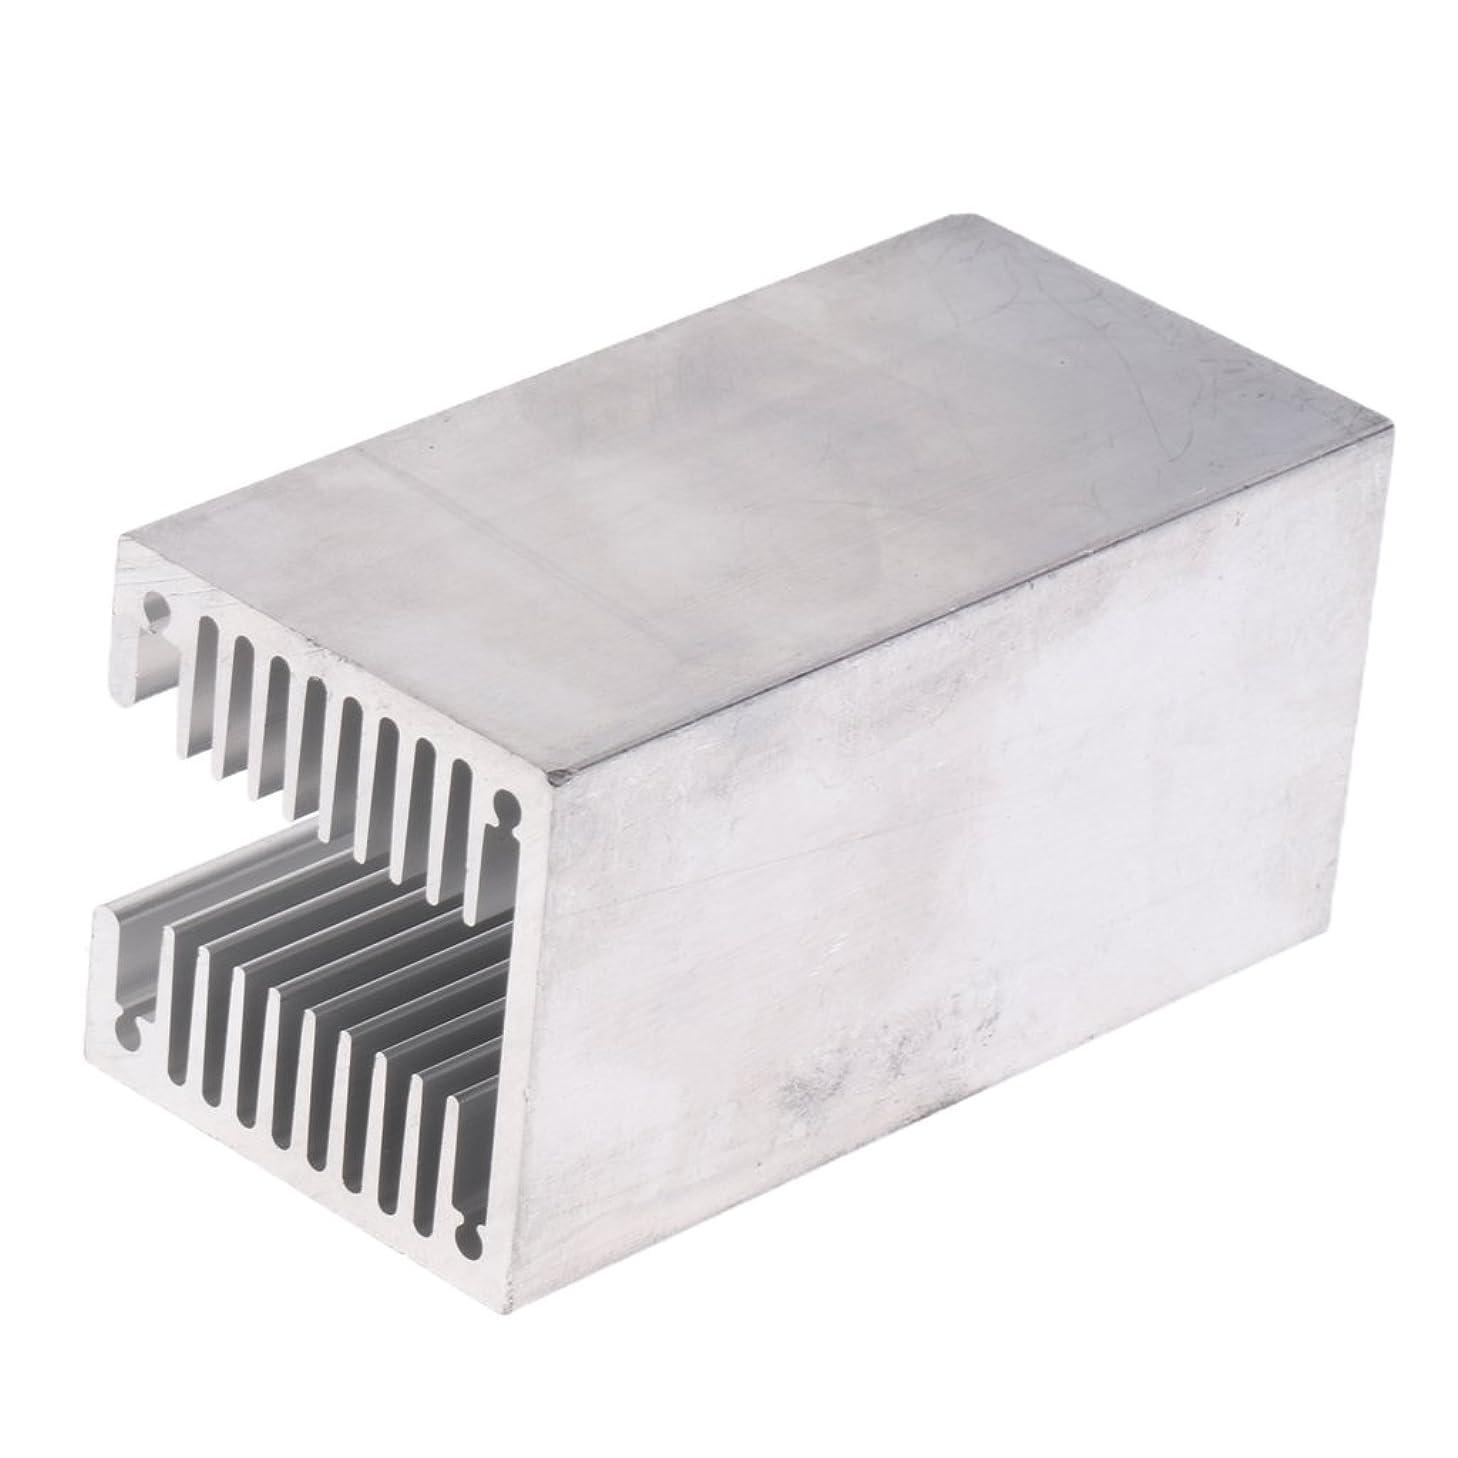 Flameer Aluminum Heatsink Radiator U Slotted HeatSink Cooling Cooler 40x40x80mm